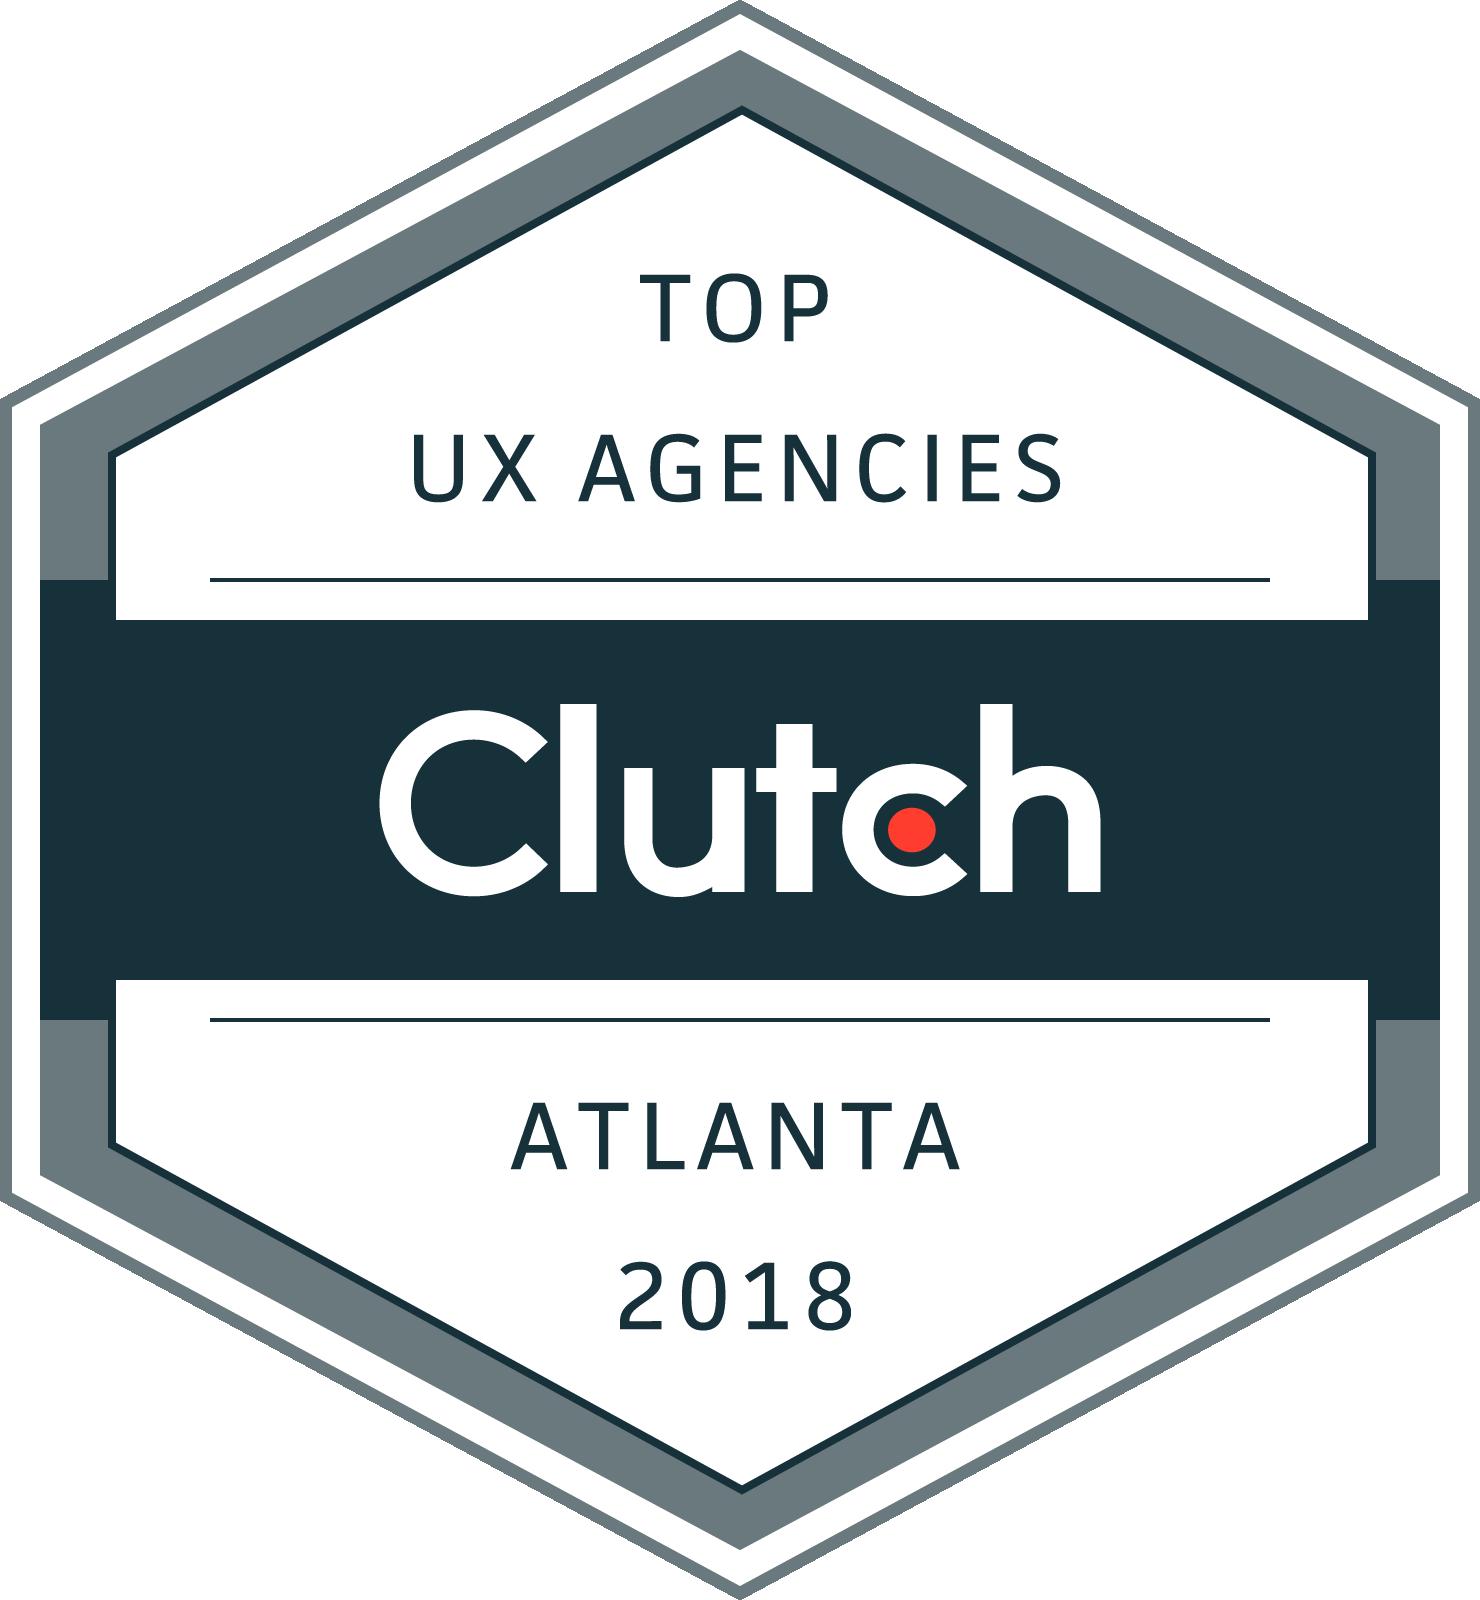 UX_Agencies_Atlanta_2018.png